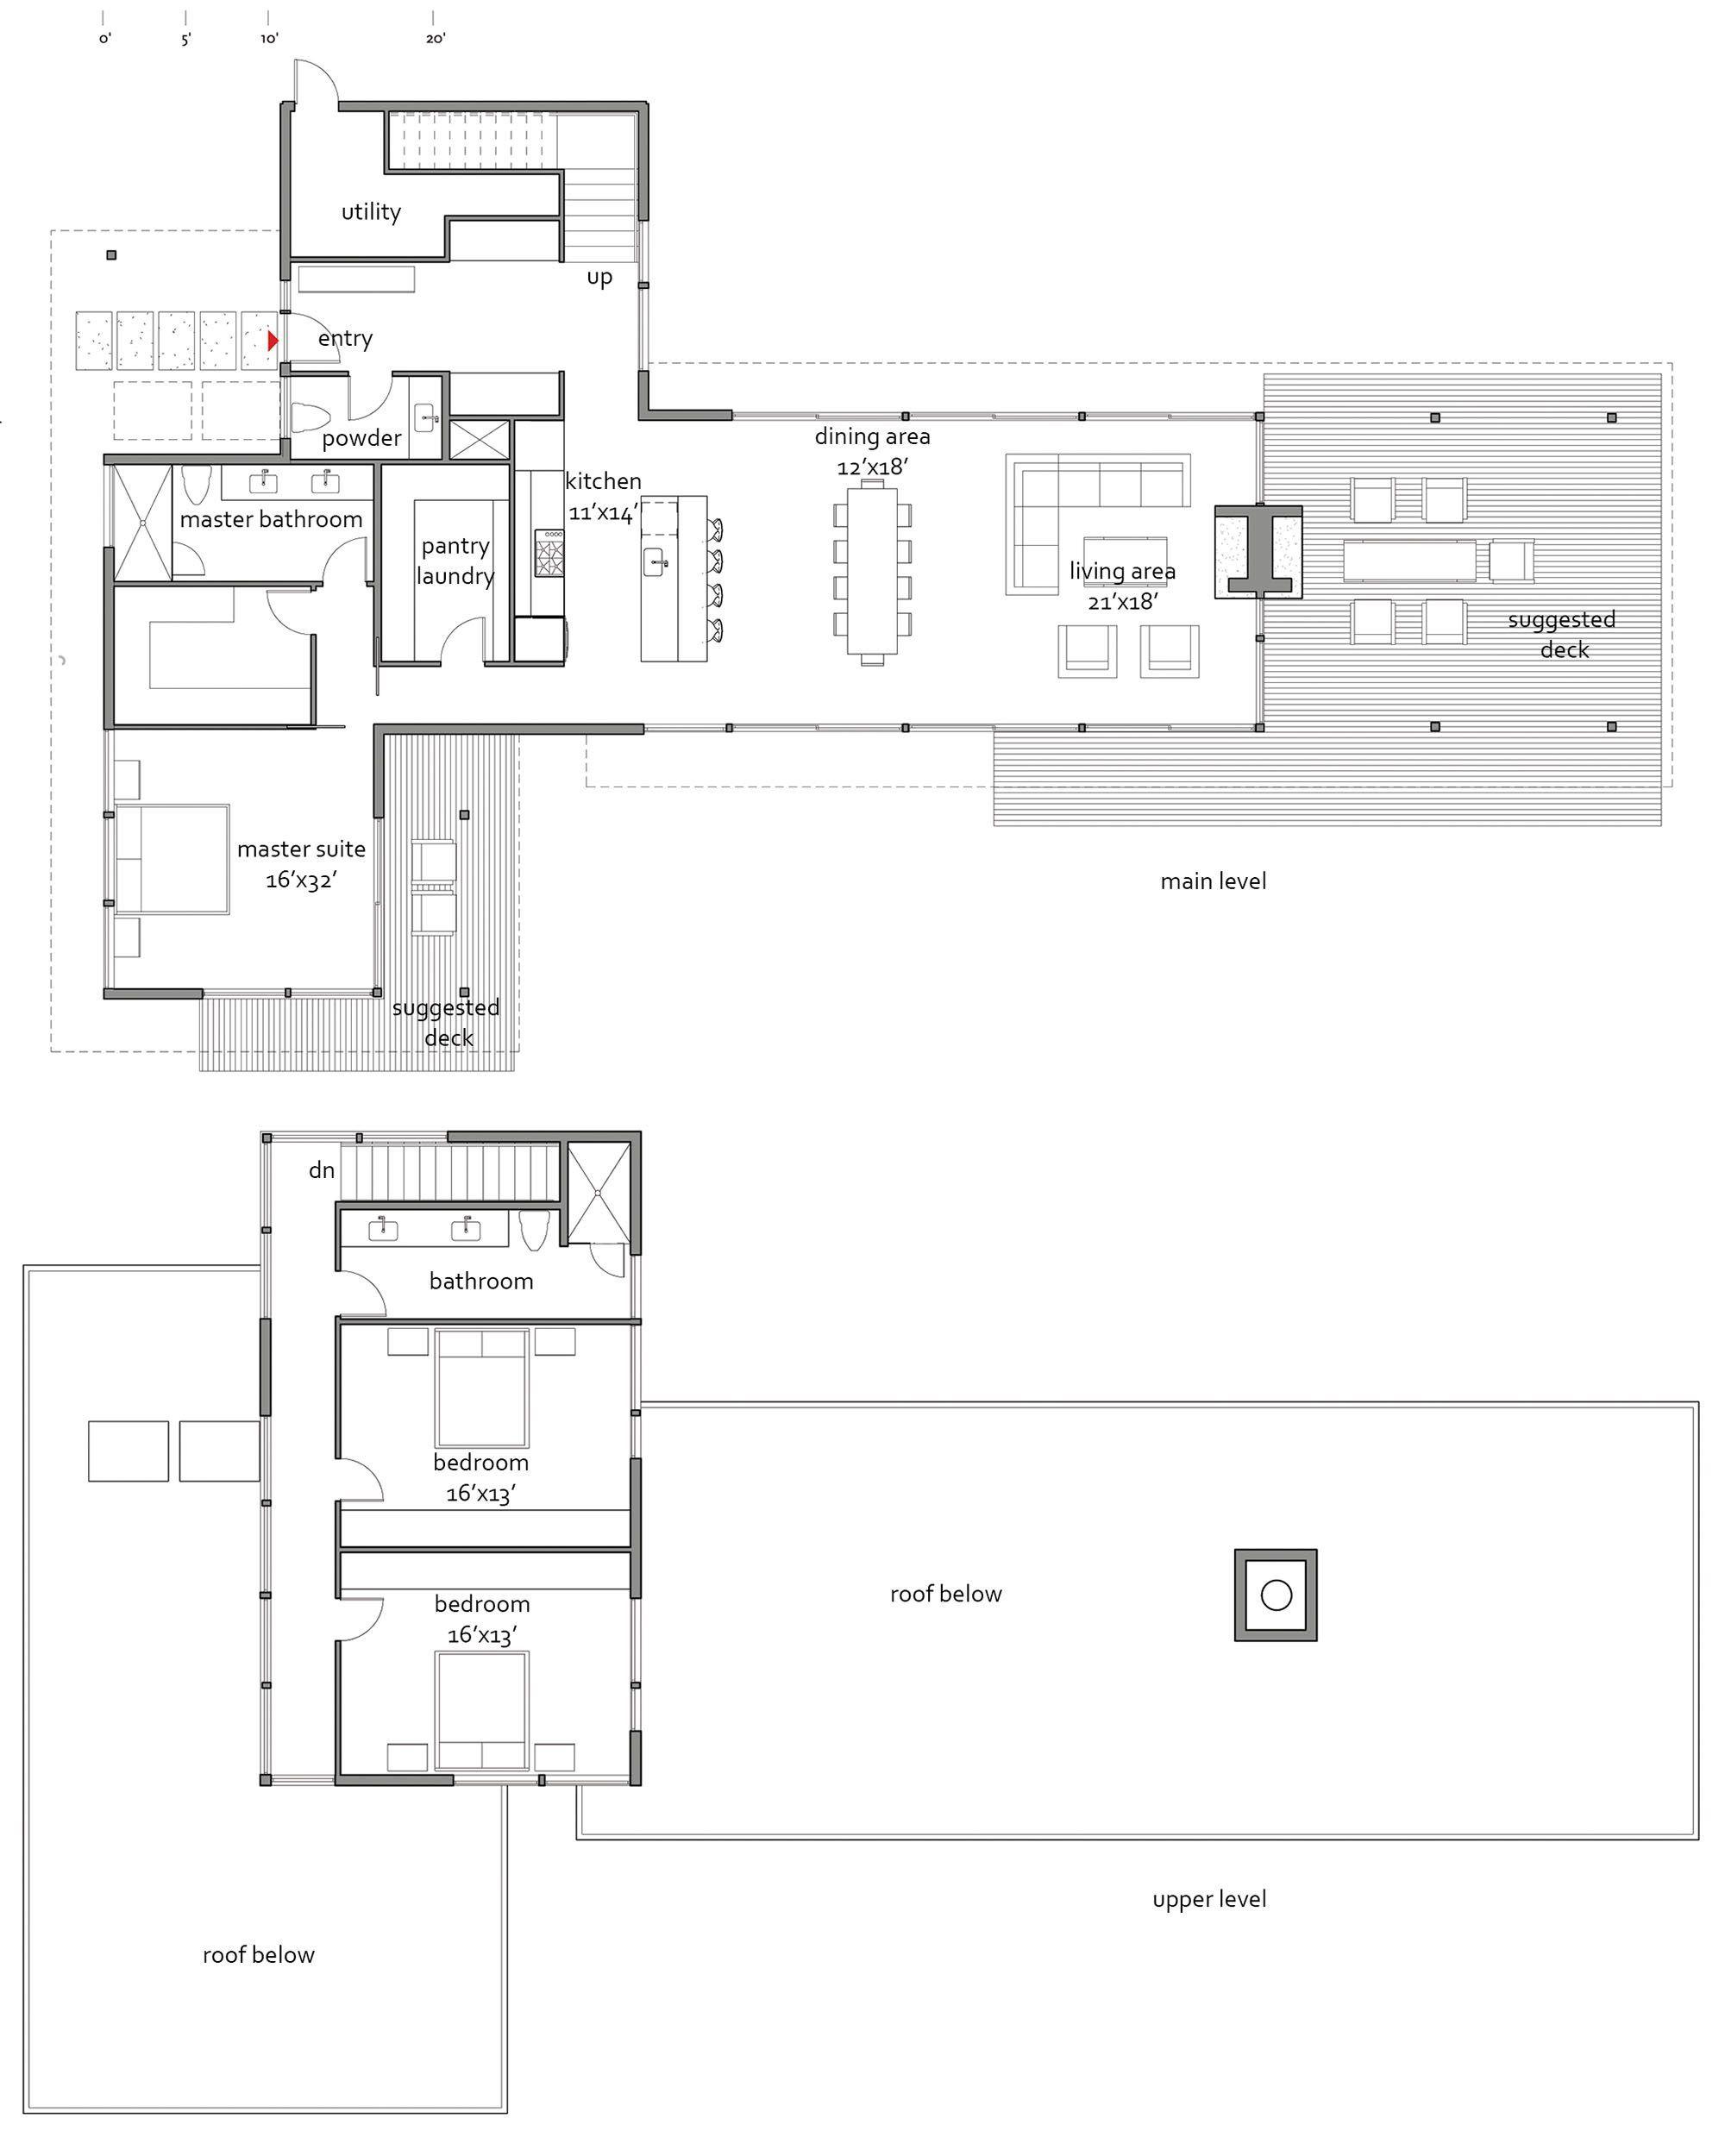 marmol radziner 2809 floor plan design for lindal cedar homes - Lindal Cedar Home Floor Plans